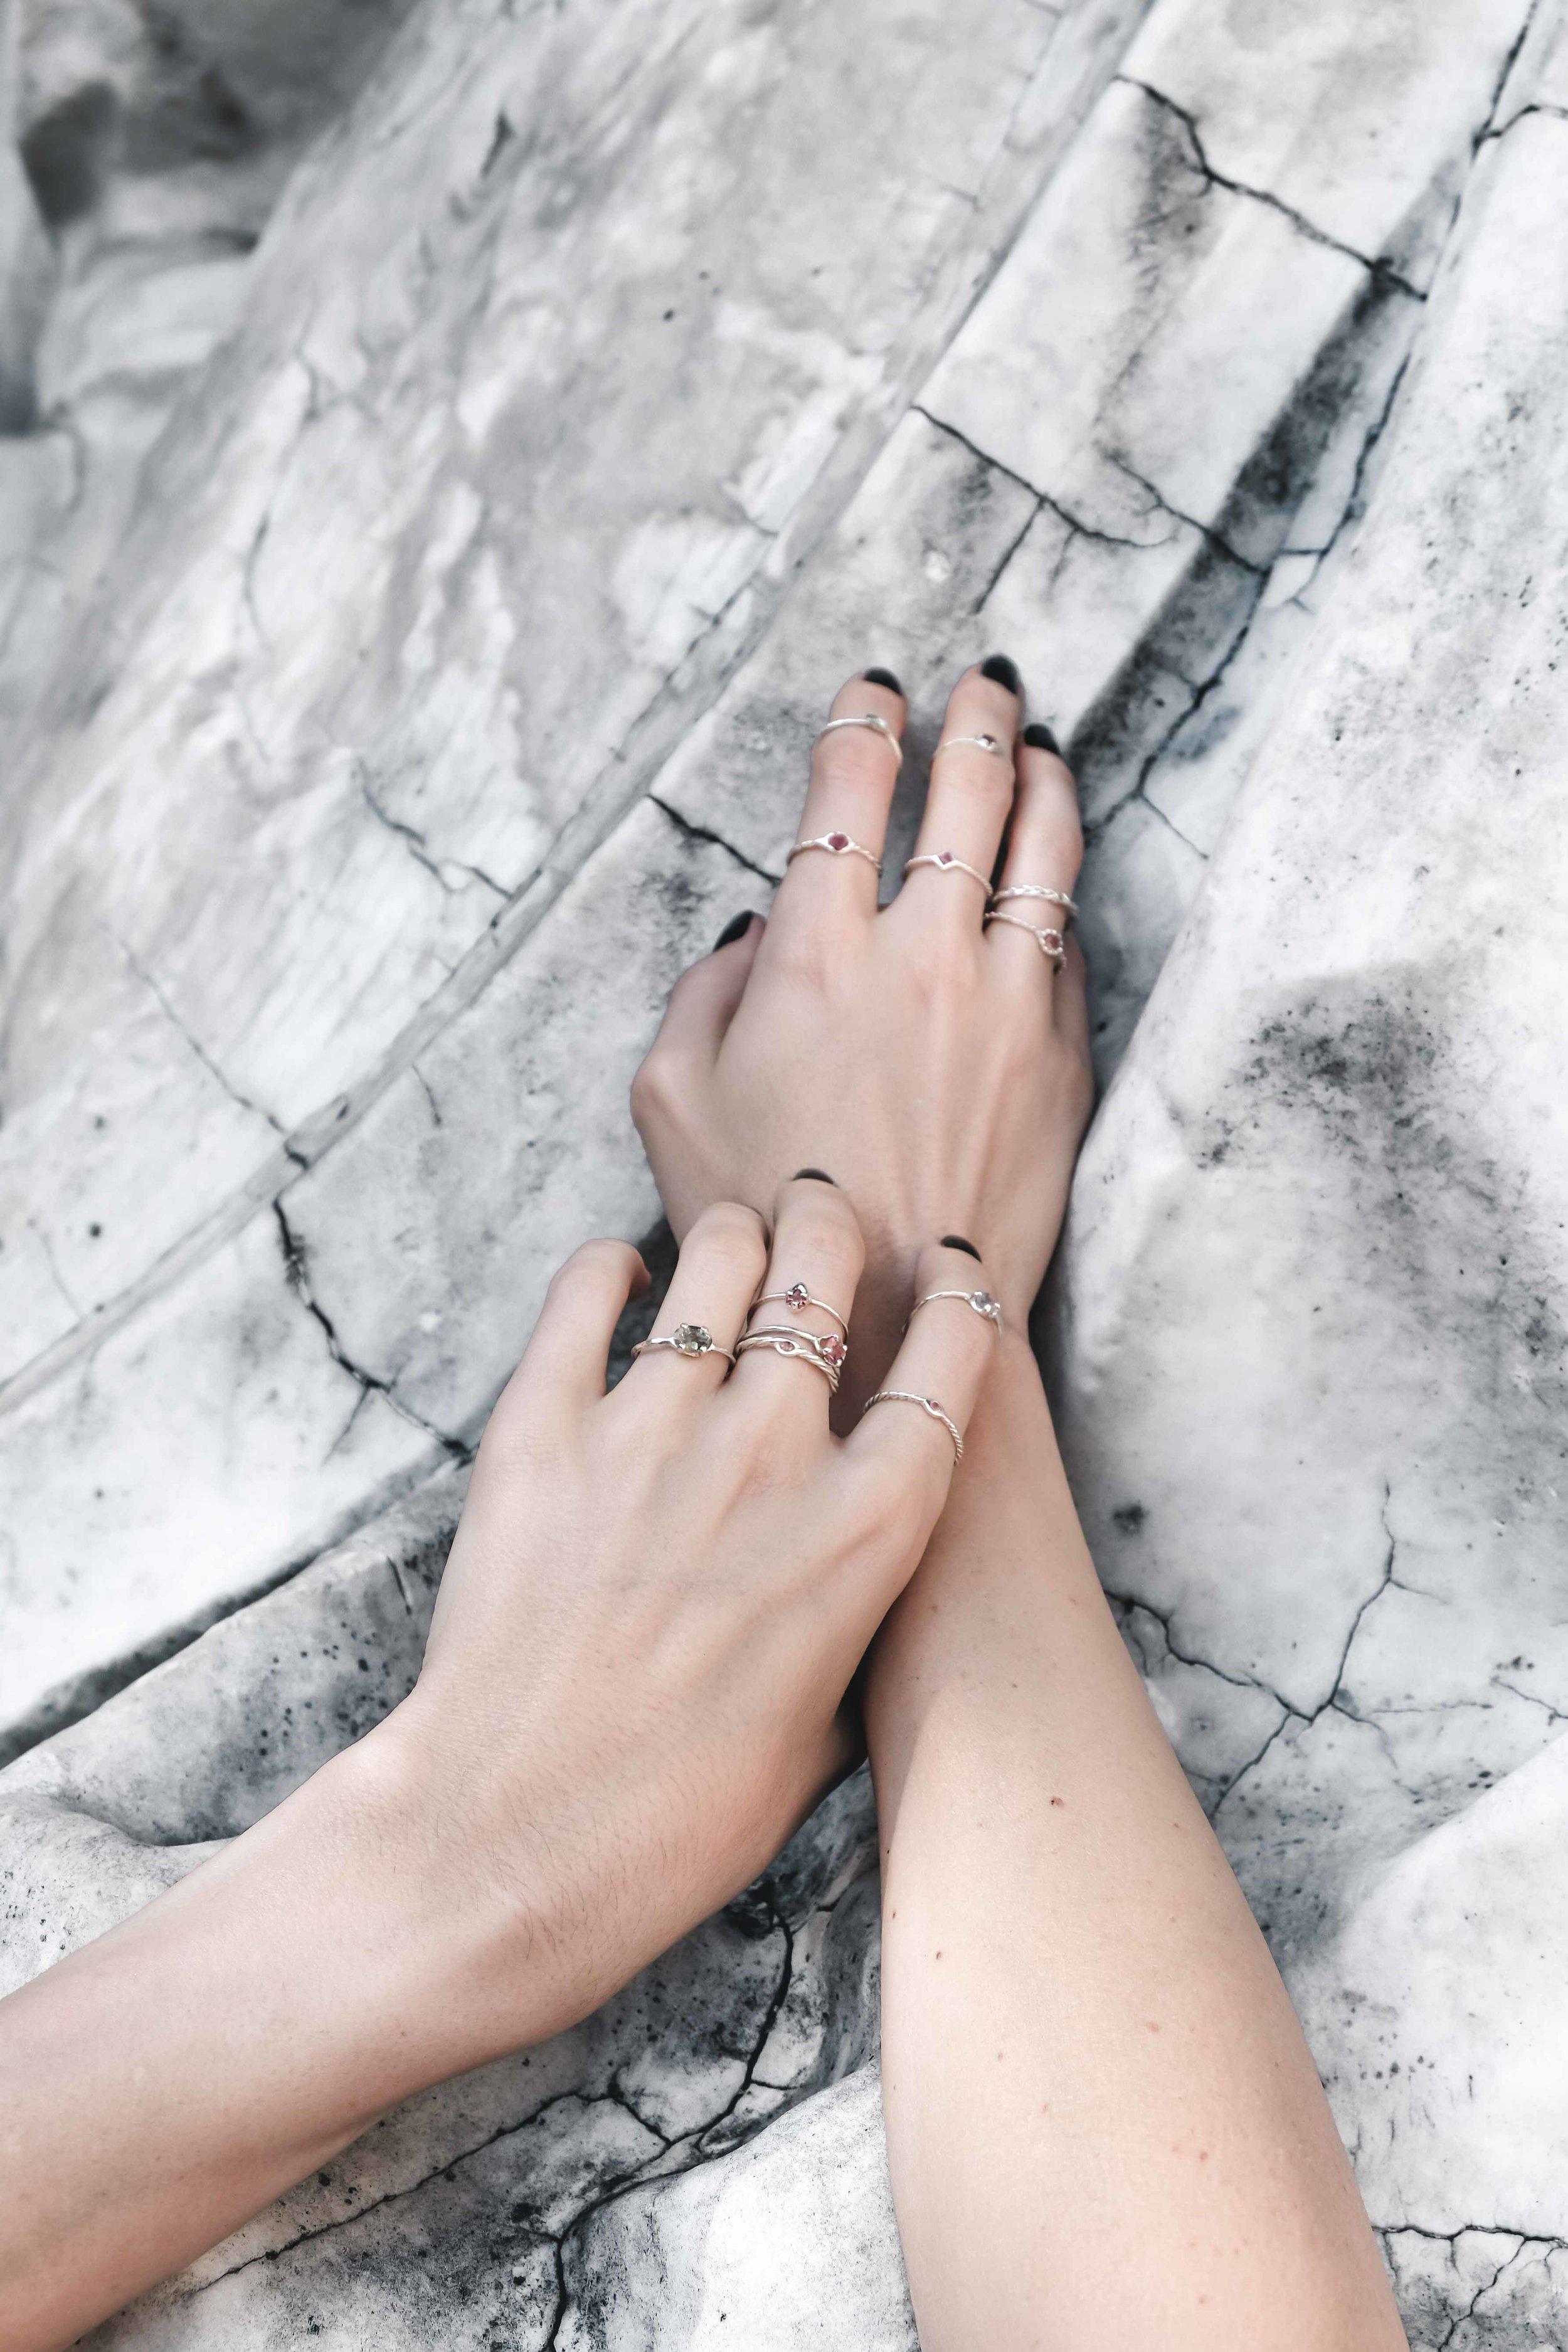 silver-jewelry-rings-tourmaline-the-black-alchemy-3.jpg